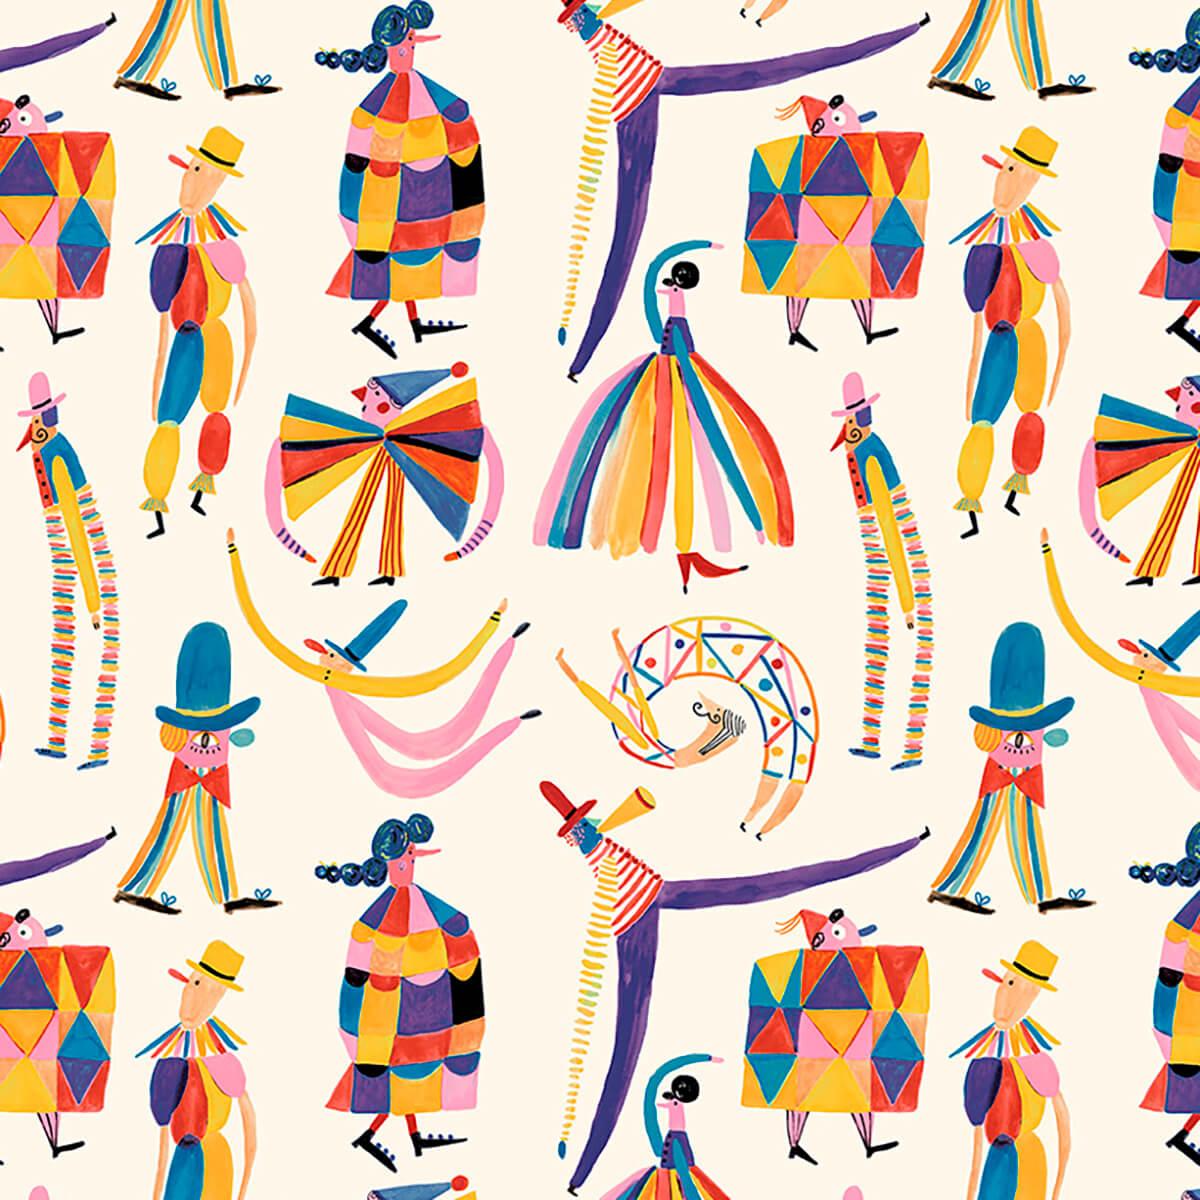 Papel de parede circo | Jana Glatt